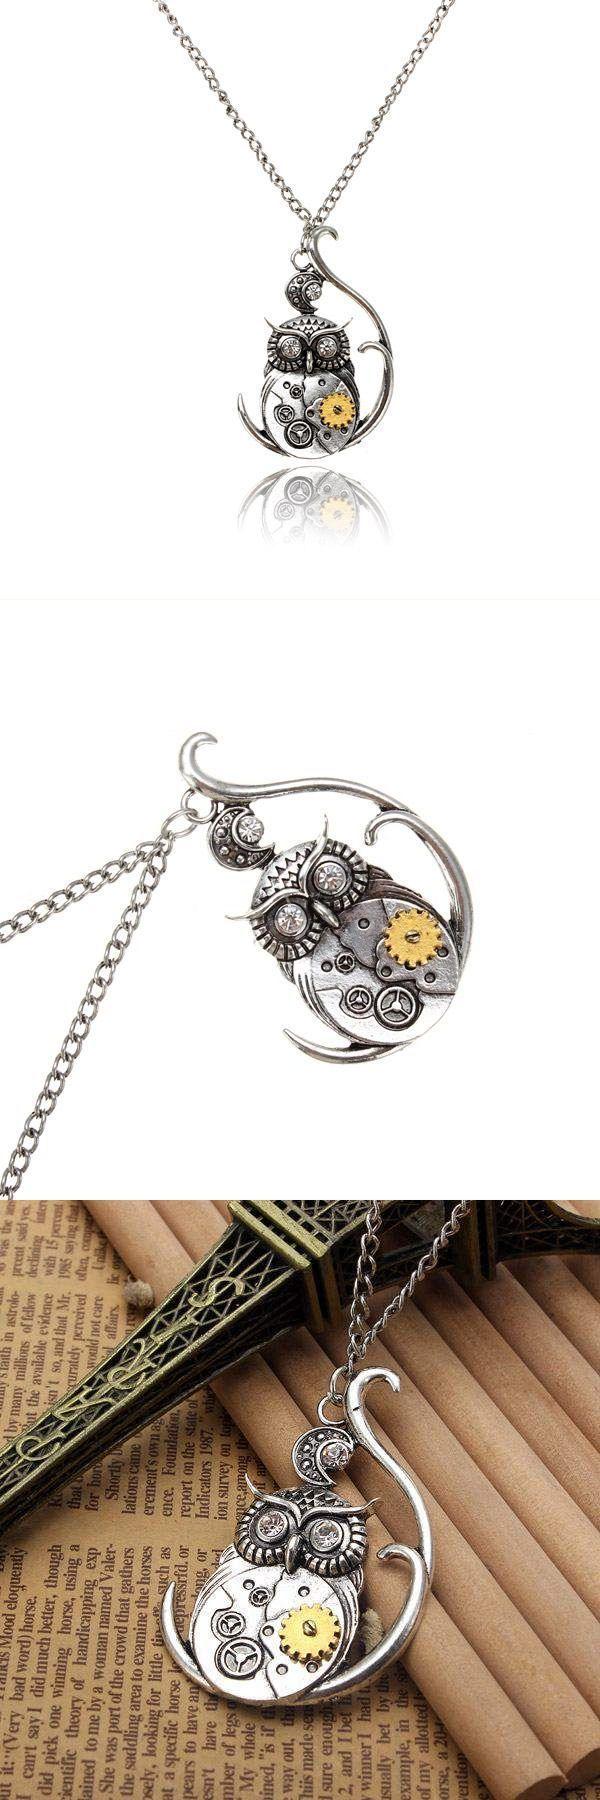 Vintage silver steampunk gear moon crystal eyes owl pendant necklace necklace pendants meanings #jewelry #pendants #diamonds #midnight #velvet #jewelry #necklaces #pendants #index #necklace #pendants #diy #necklaces #stone #pendants